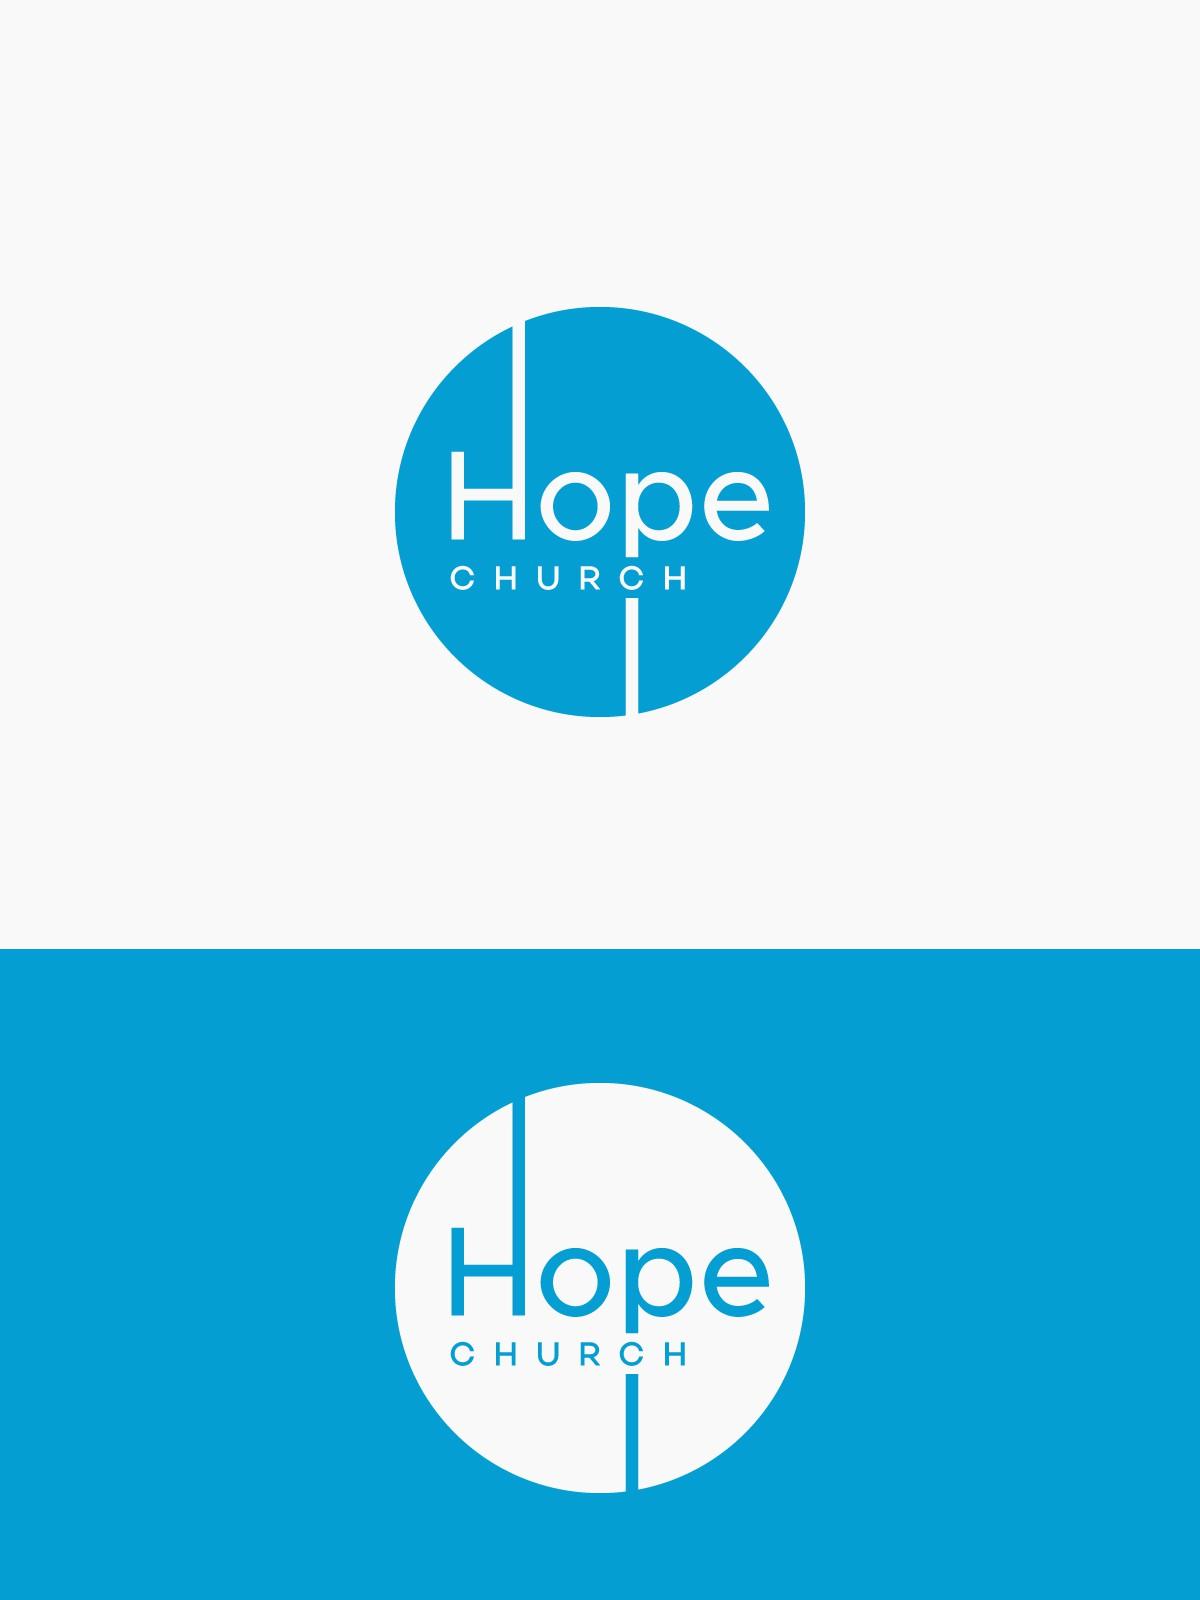 HOPE CHURCH REBRAND